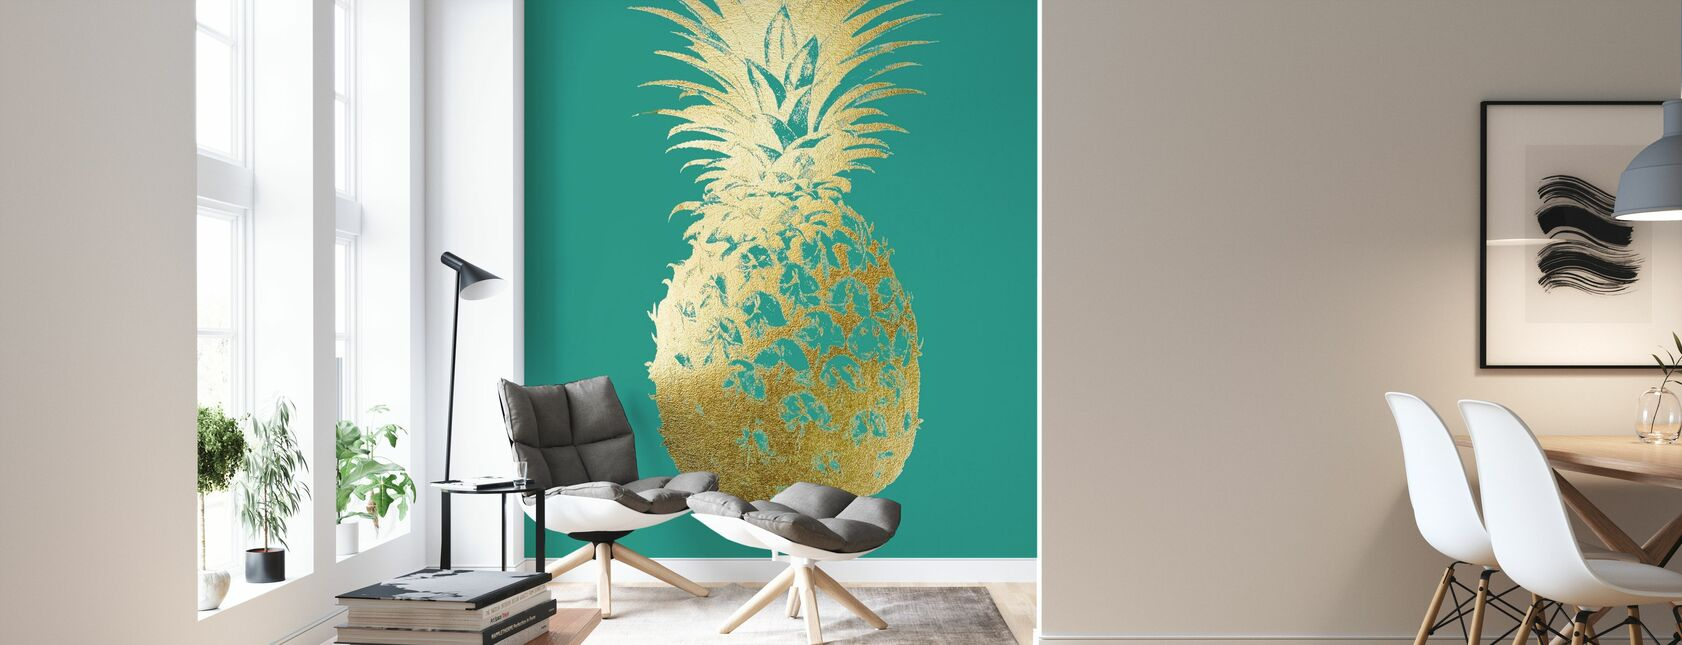 Ananas Emerald - Tapetti - Olohuone